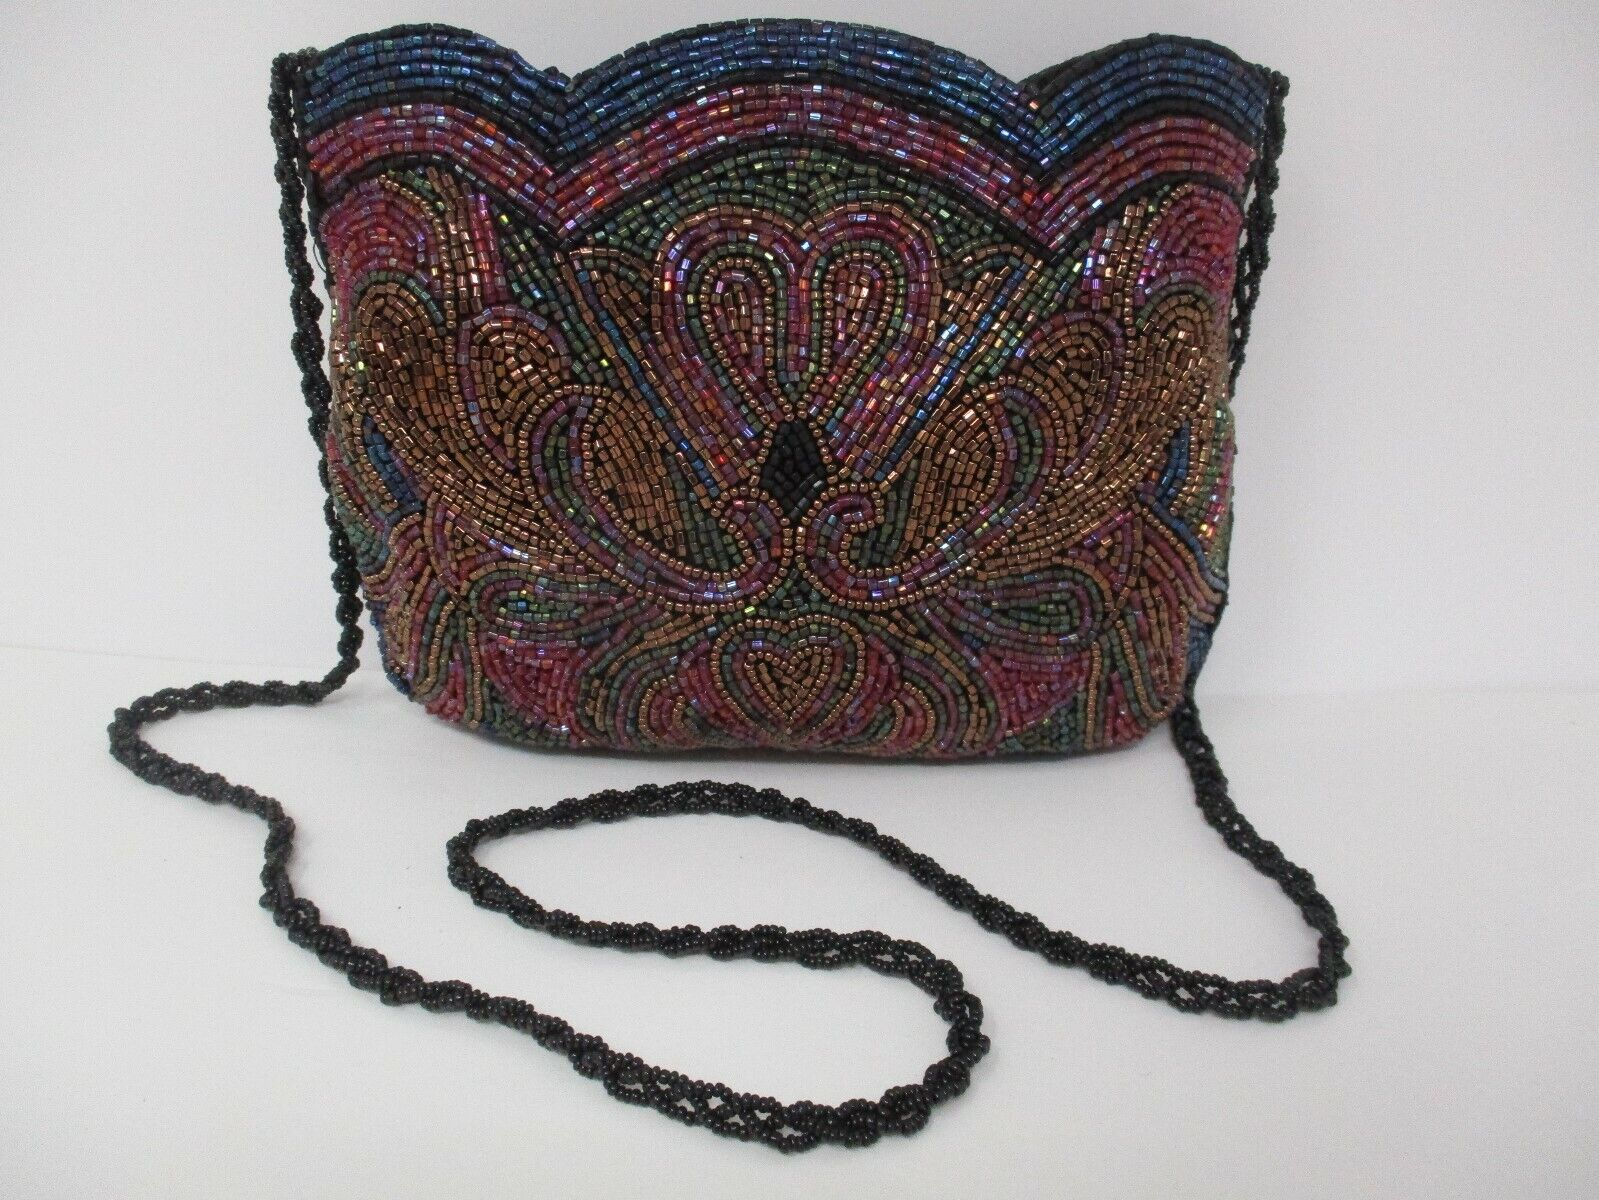 Vintage Metallic Mosaic Beaded Small Purse Shoulder Bag